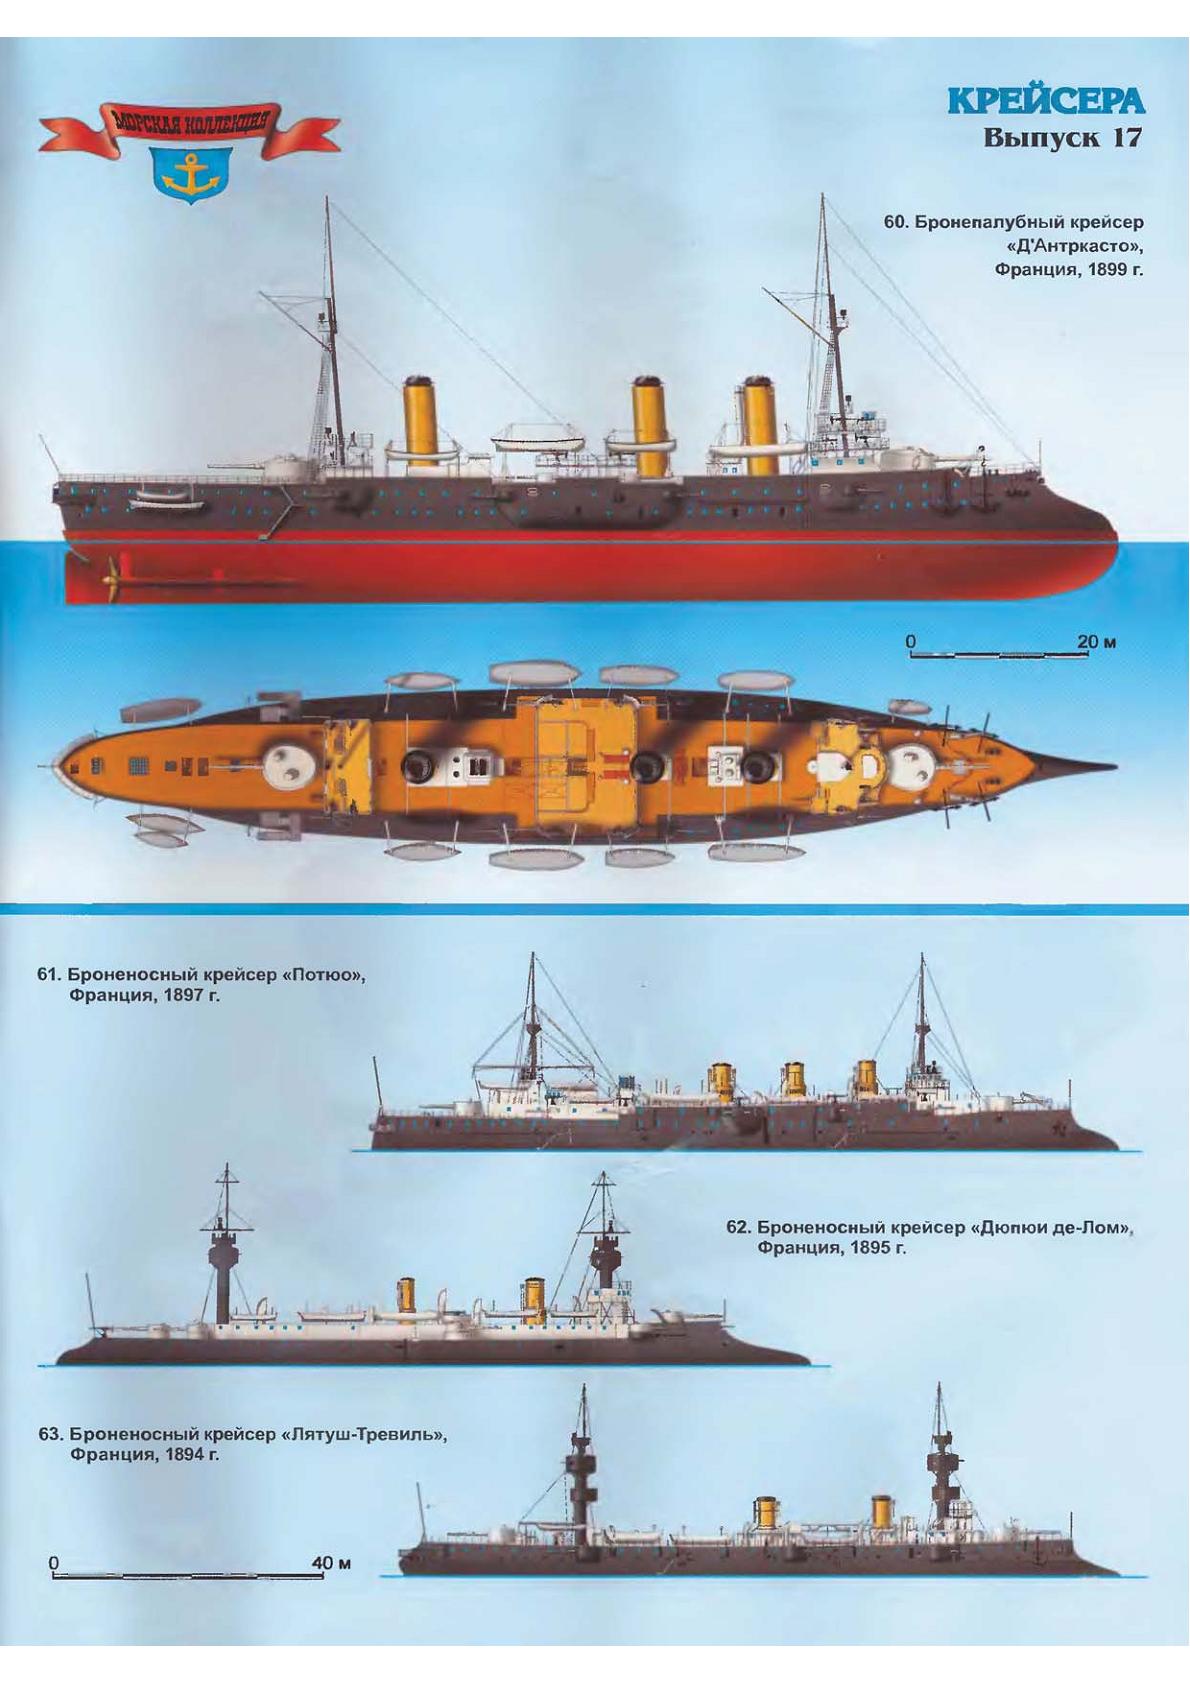 D'Entrecasteaux Protected Cruiser Battleship, Model